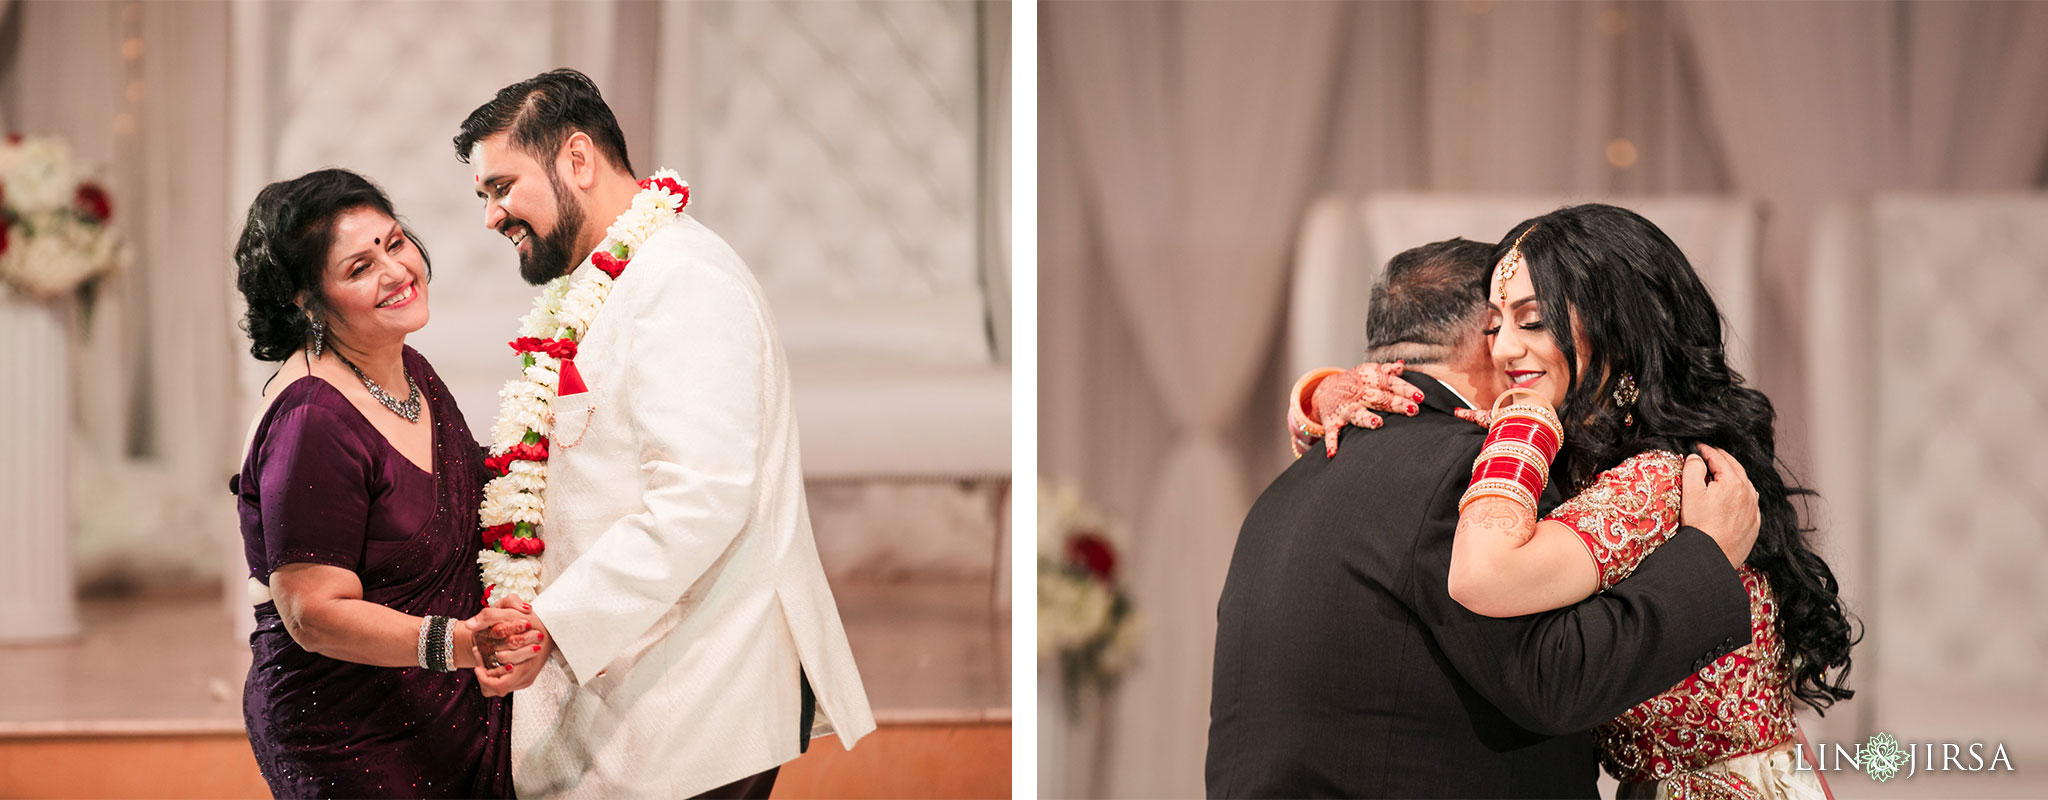 36 Diamond Bar Center Inland Empire Indian Wedding Photography